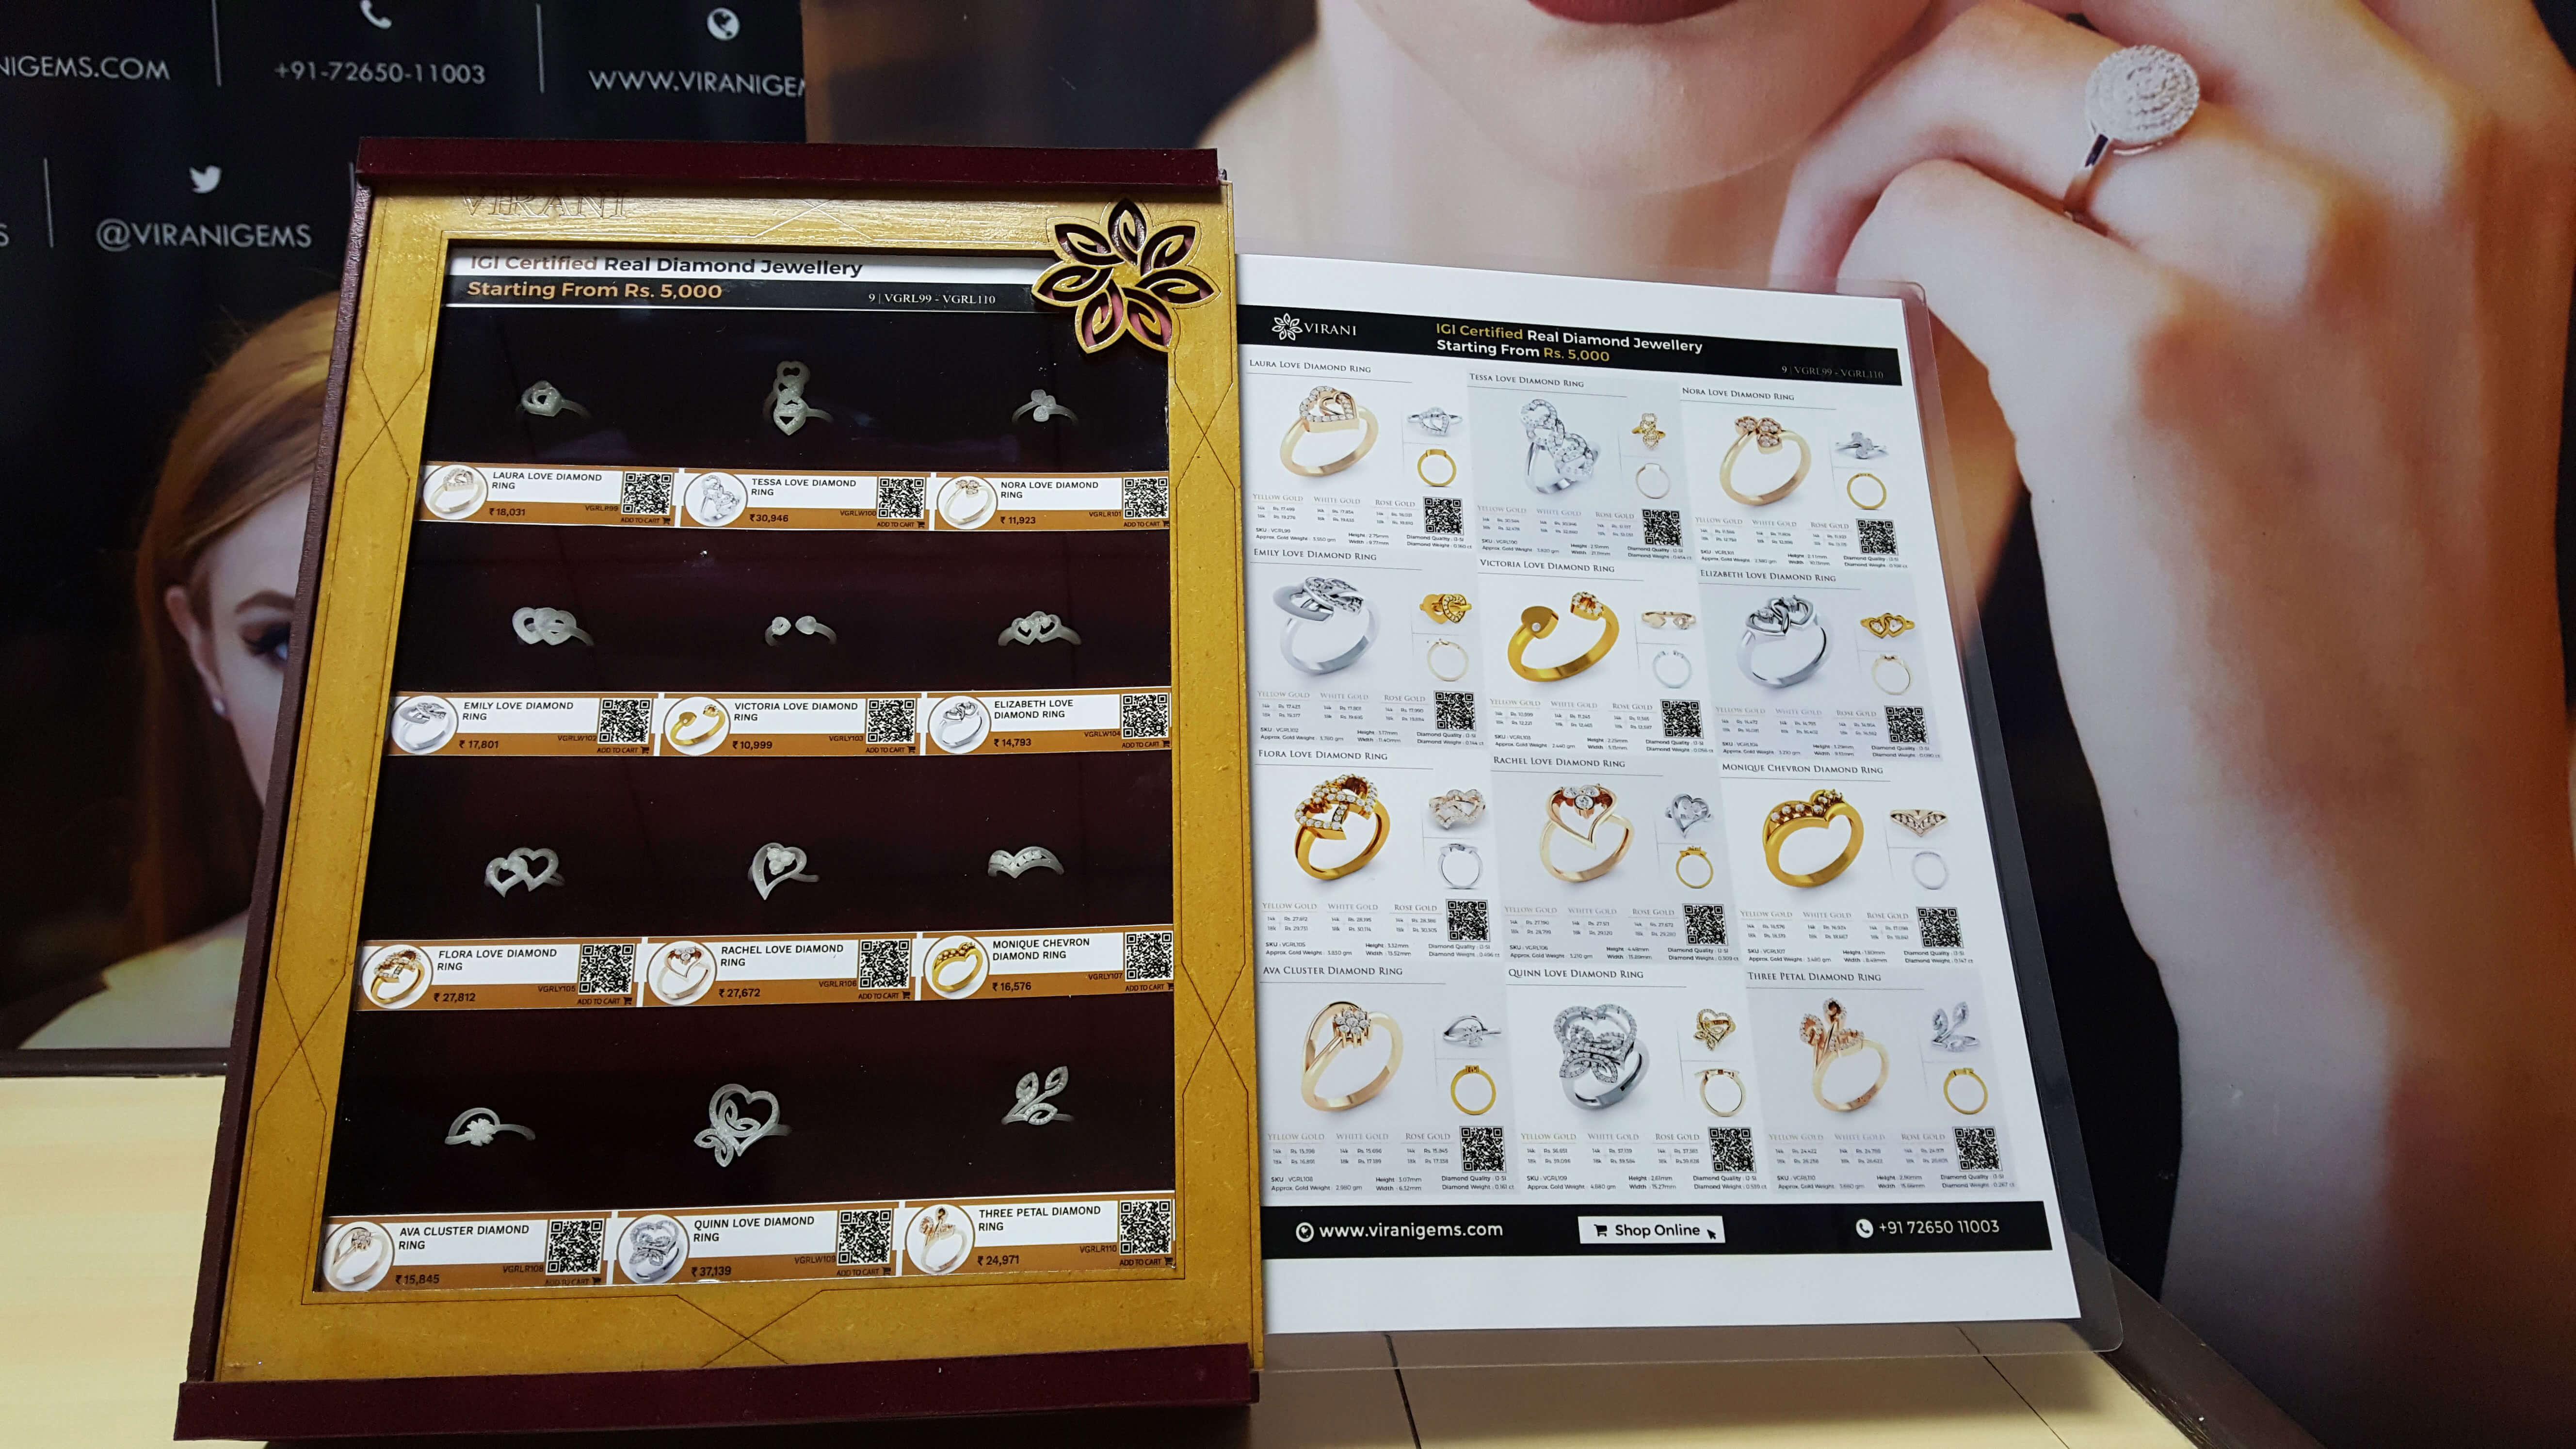 Viranigems-Diamond Jewellery Online